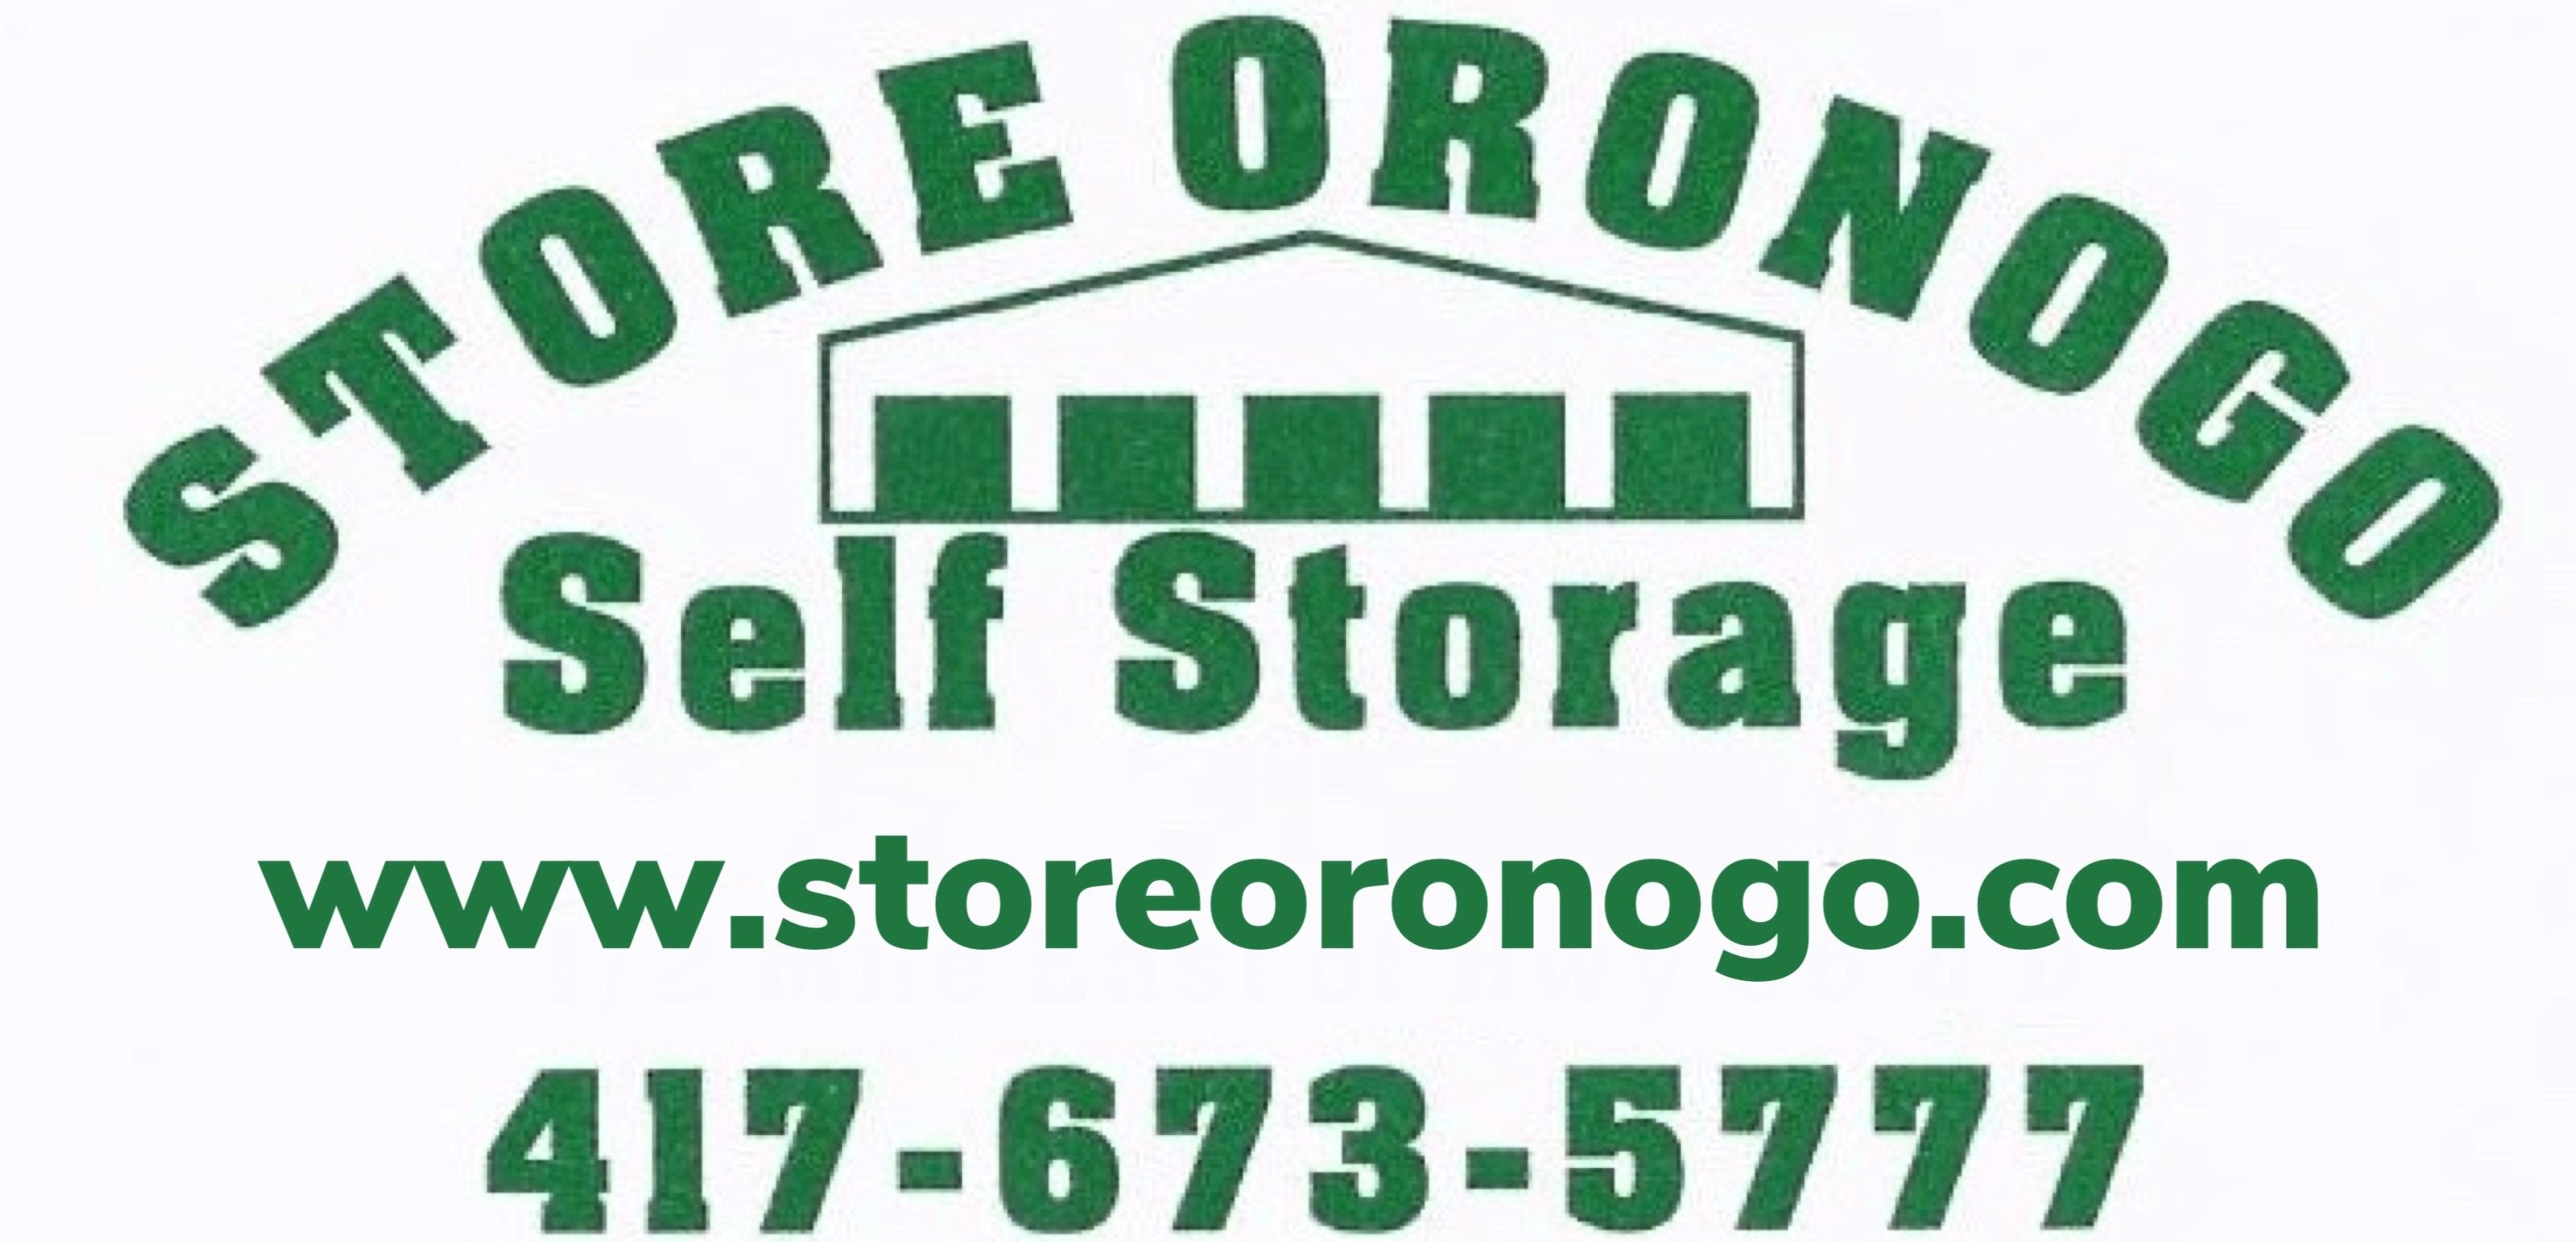 Store Oronogo Self Storage in Webb City, MO